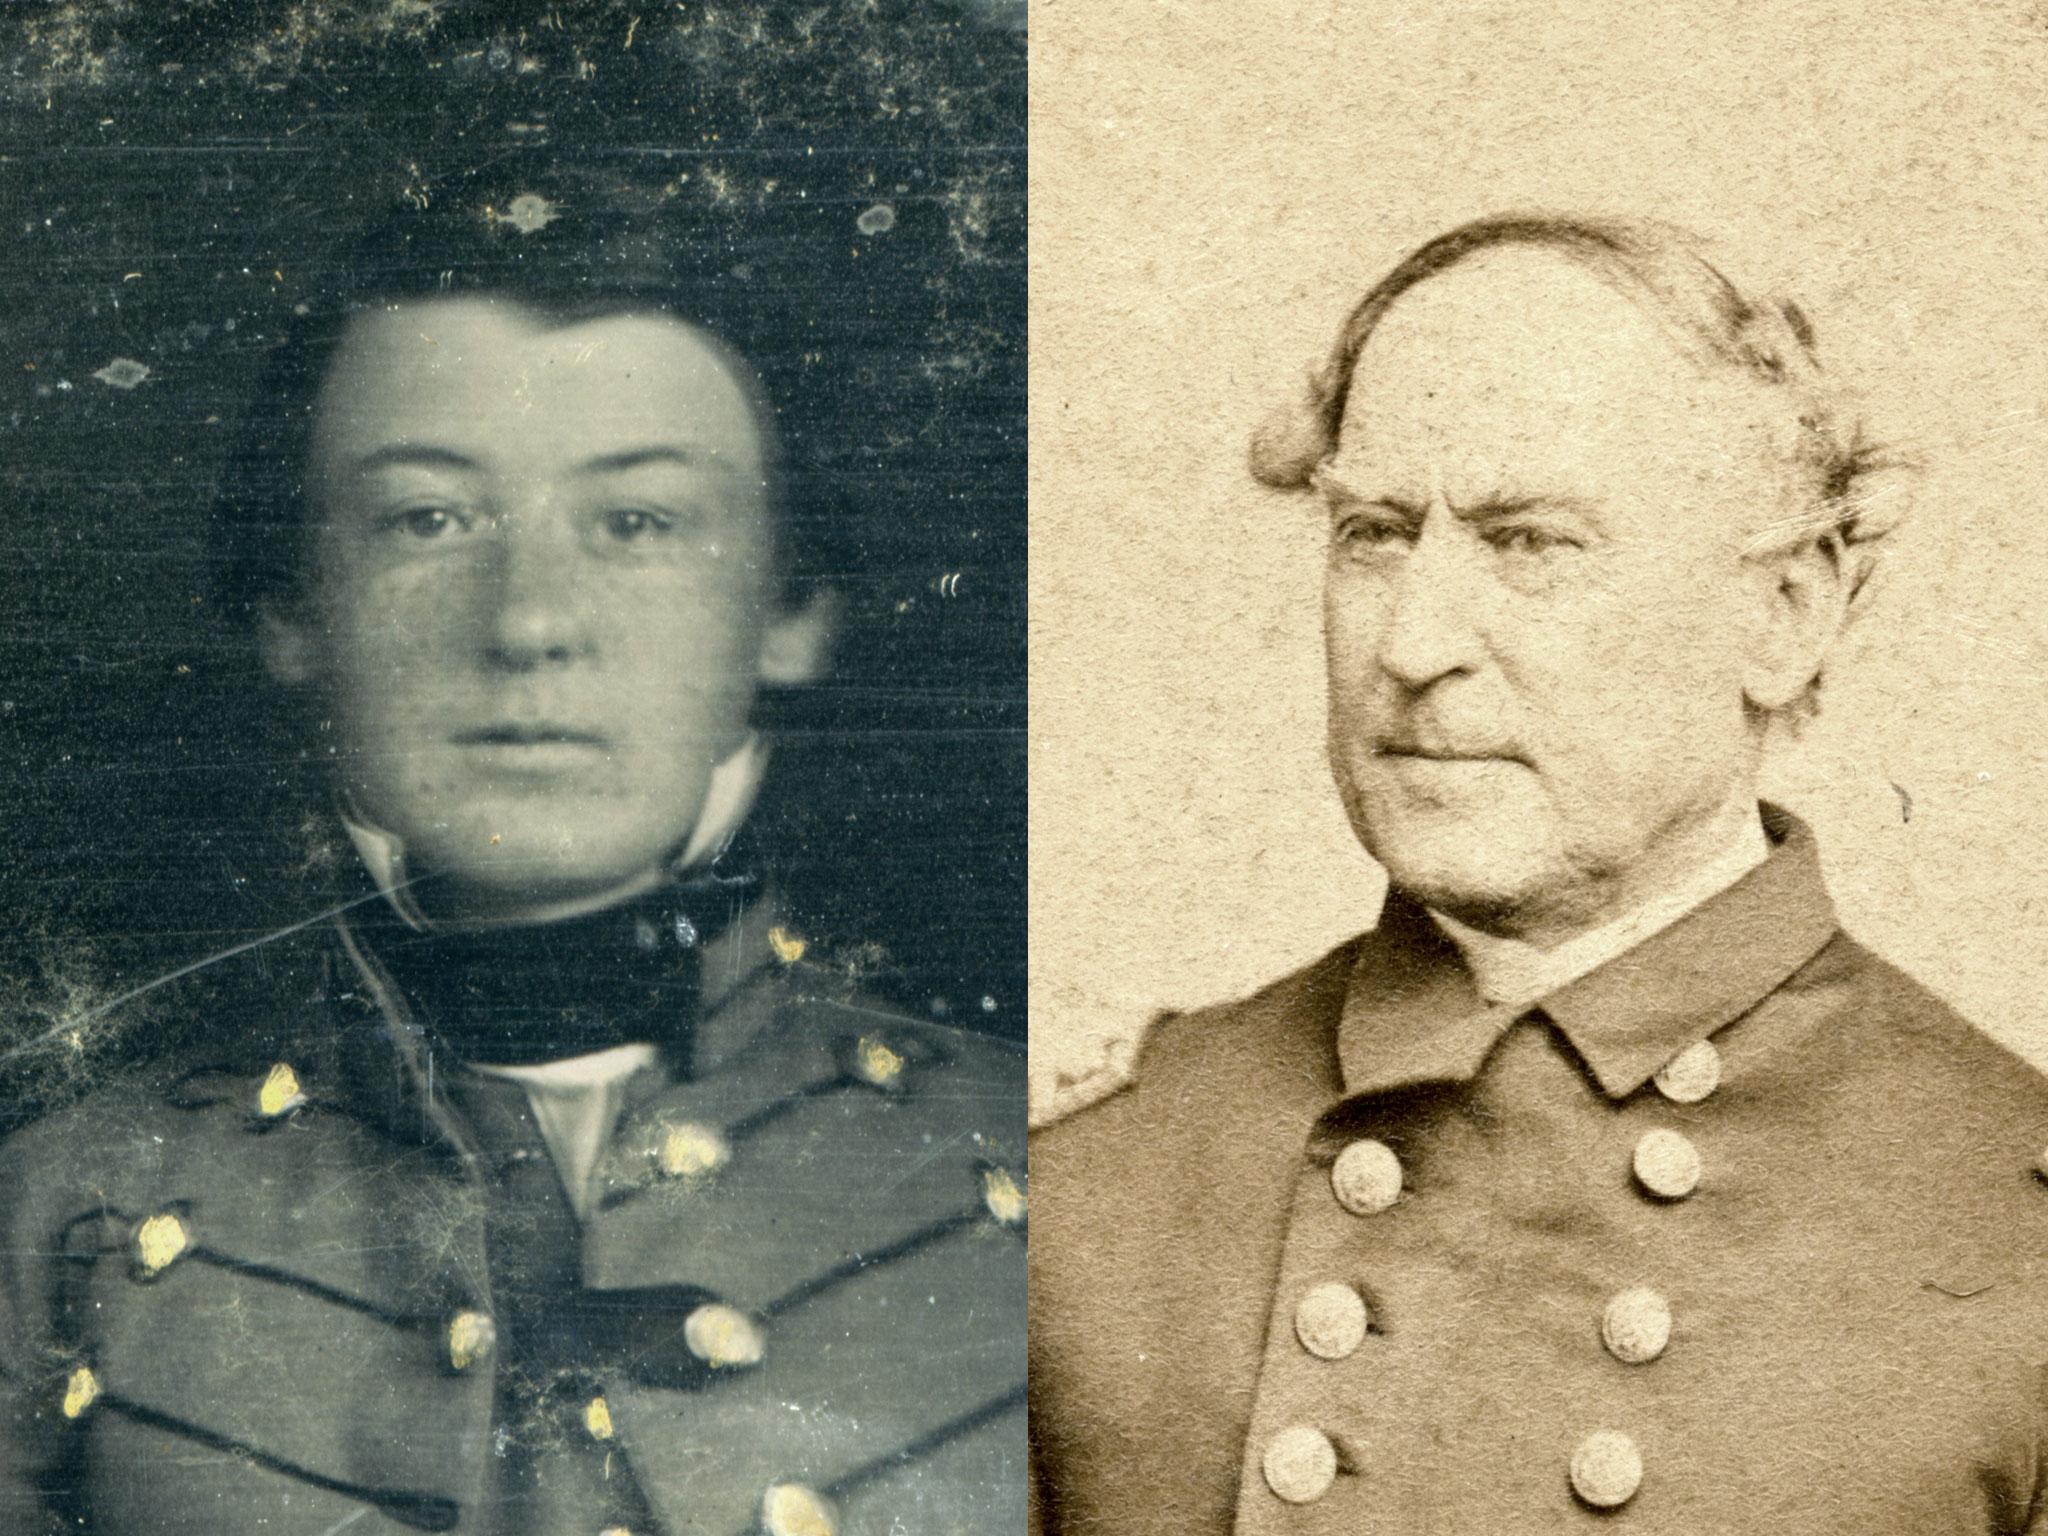 Details from the VMI daguerreotype, left, and a carte de visite of Adm. David Farragut.